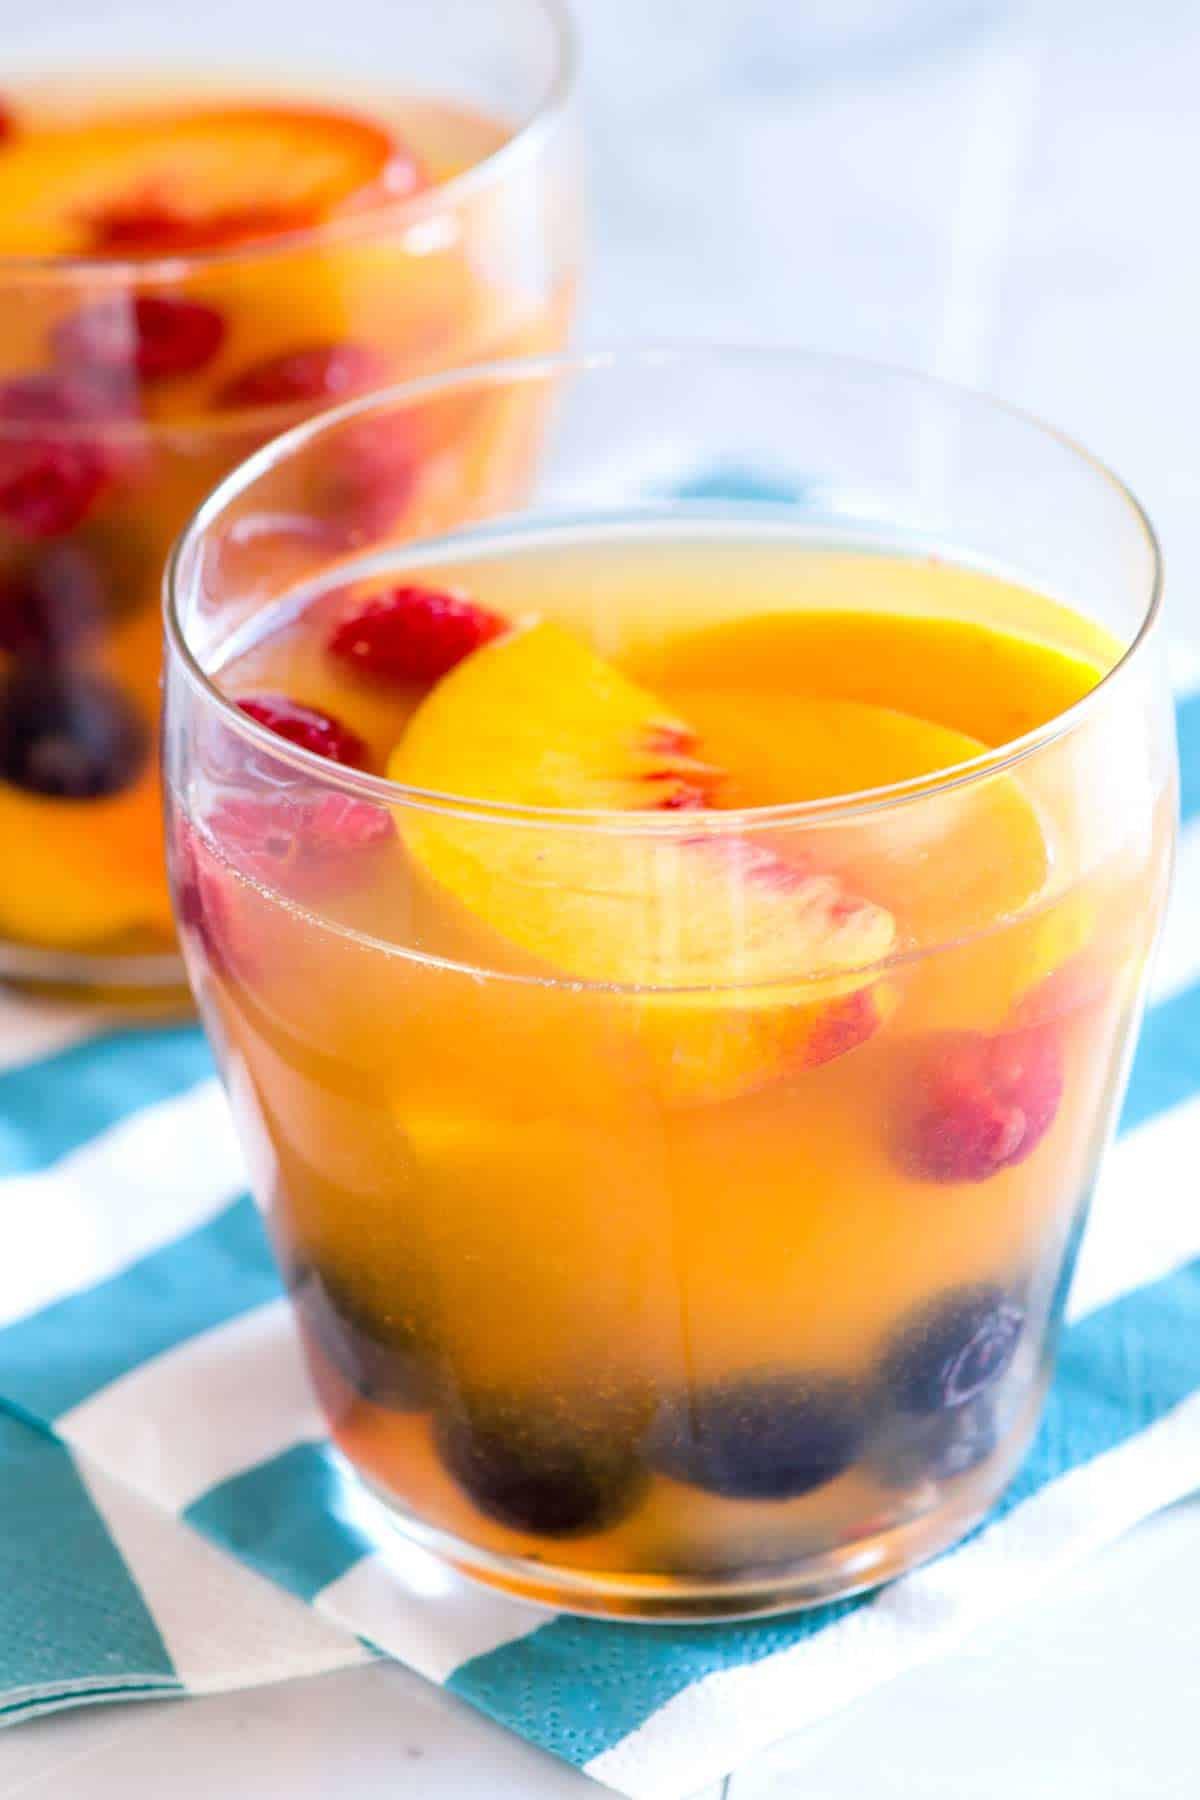 How to Make Peach Sangria with White Wine